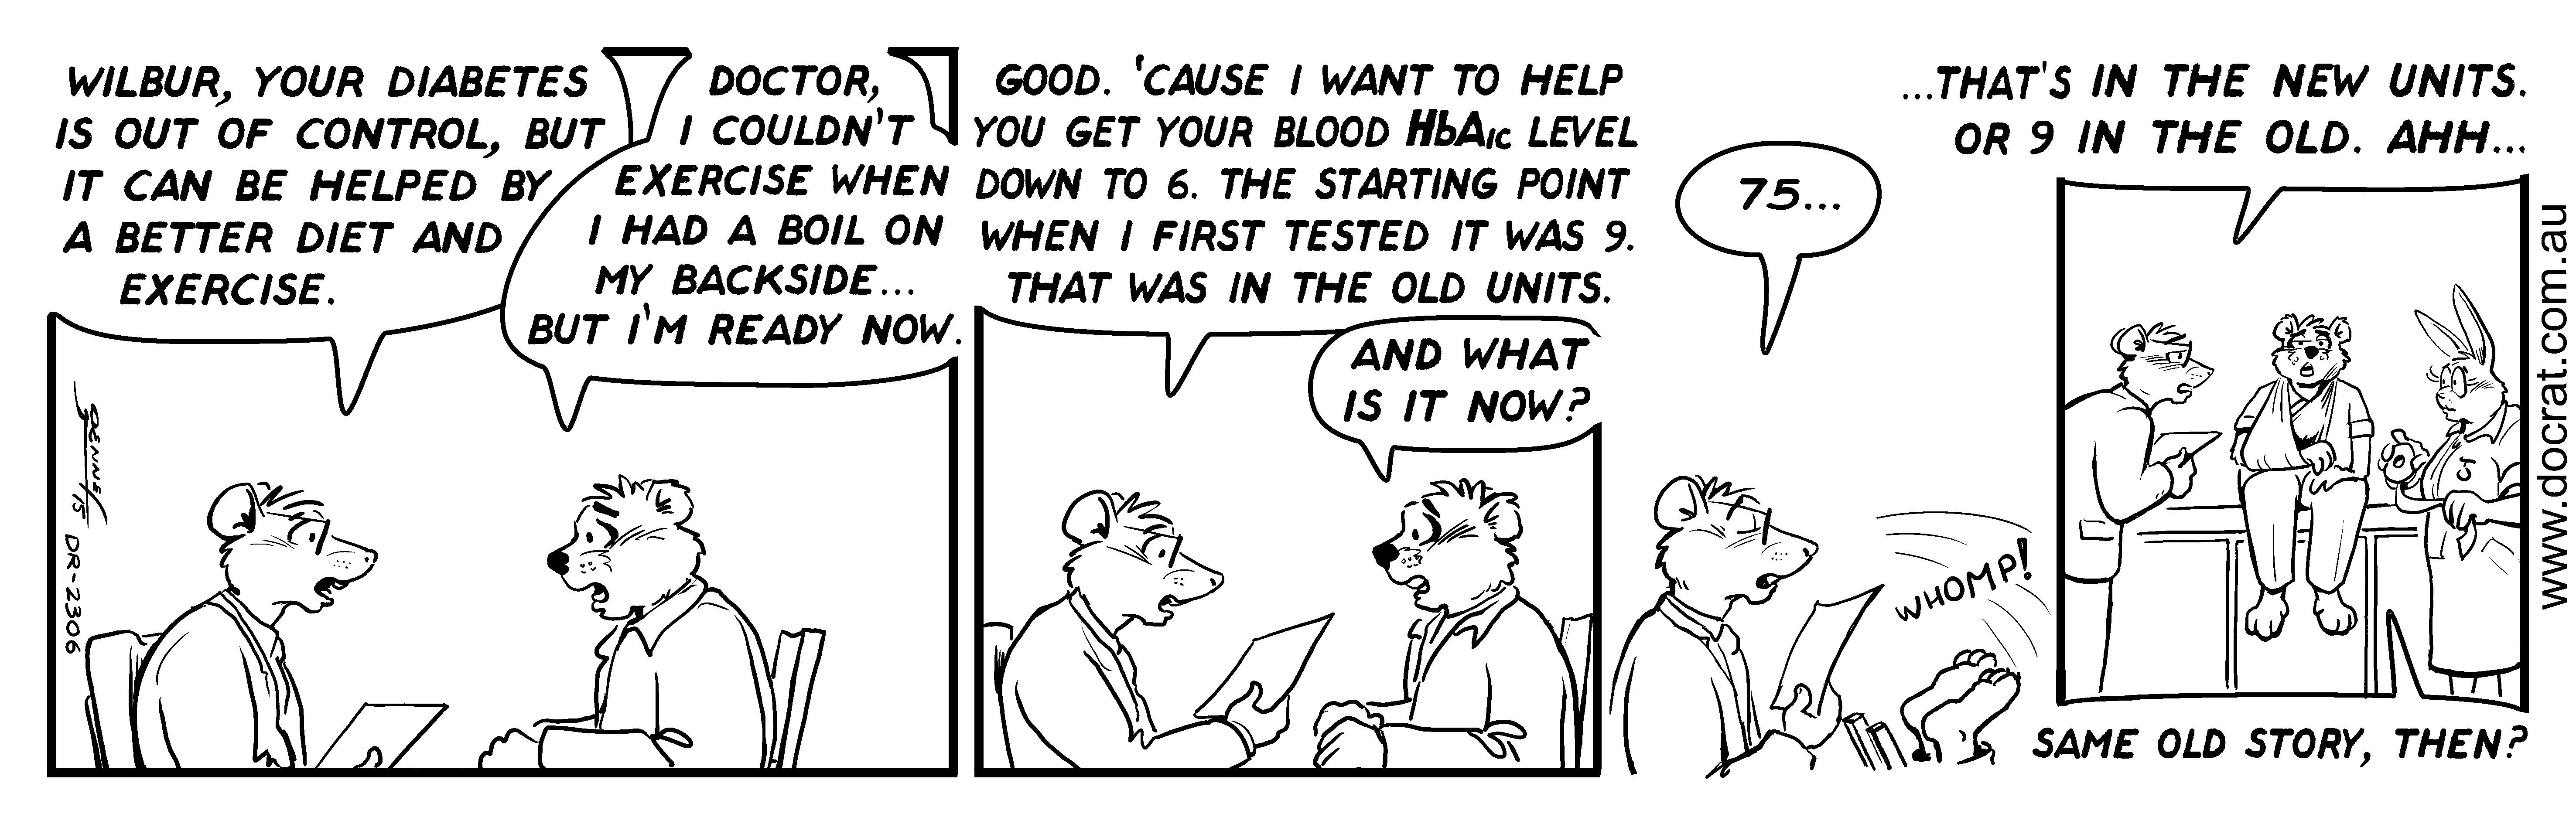 20150629